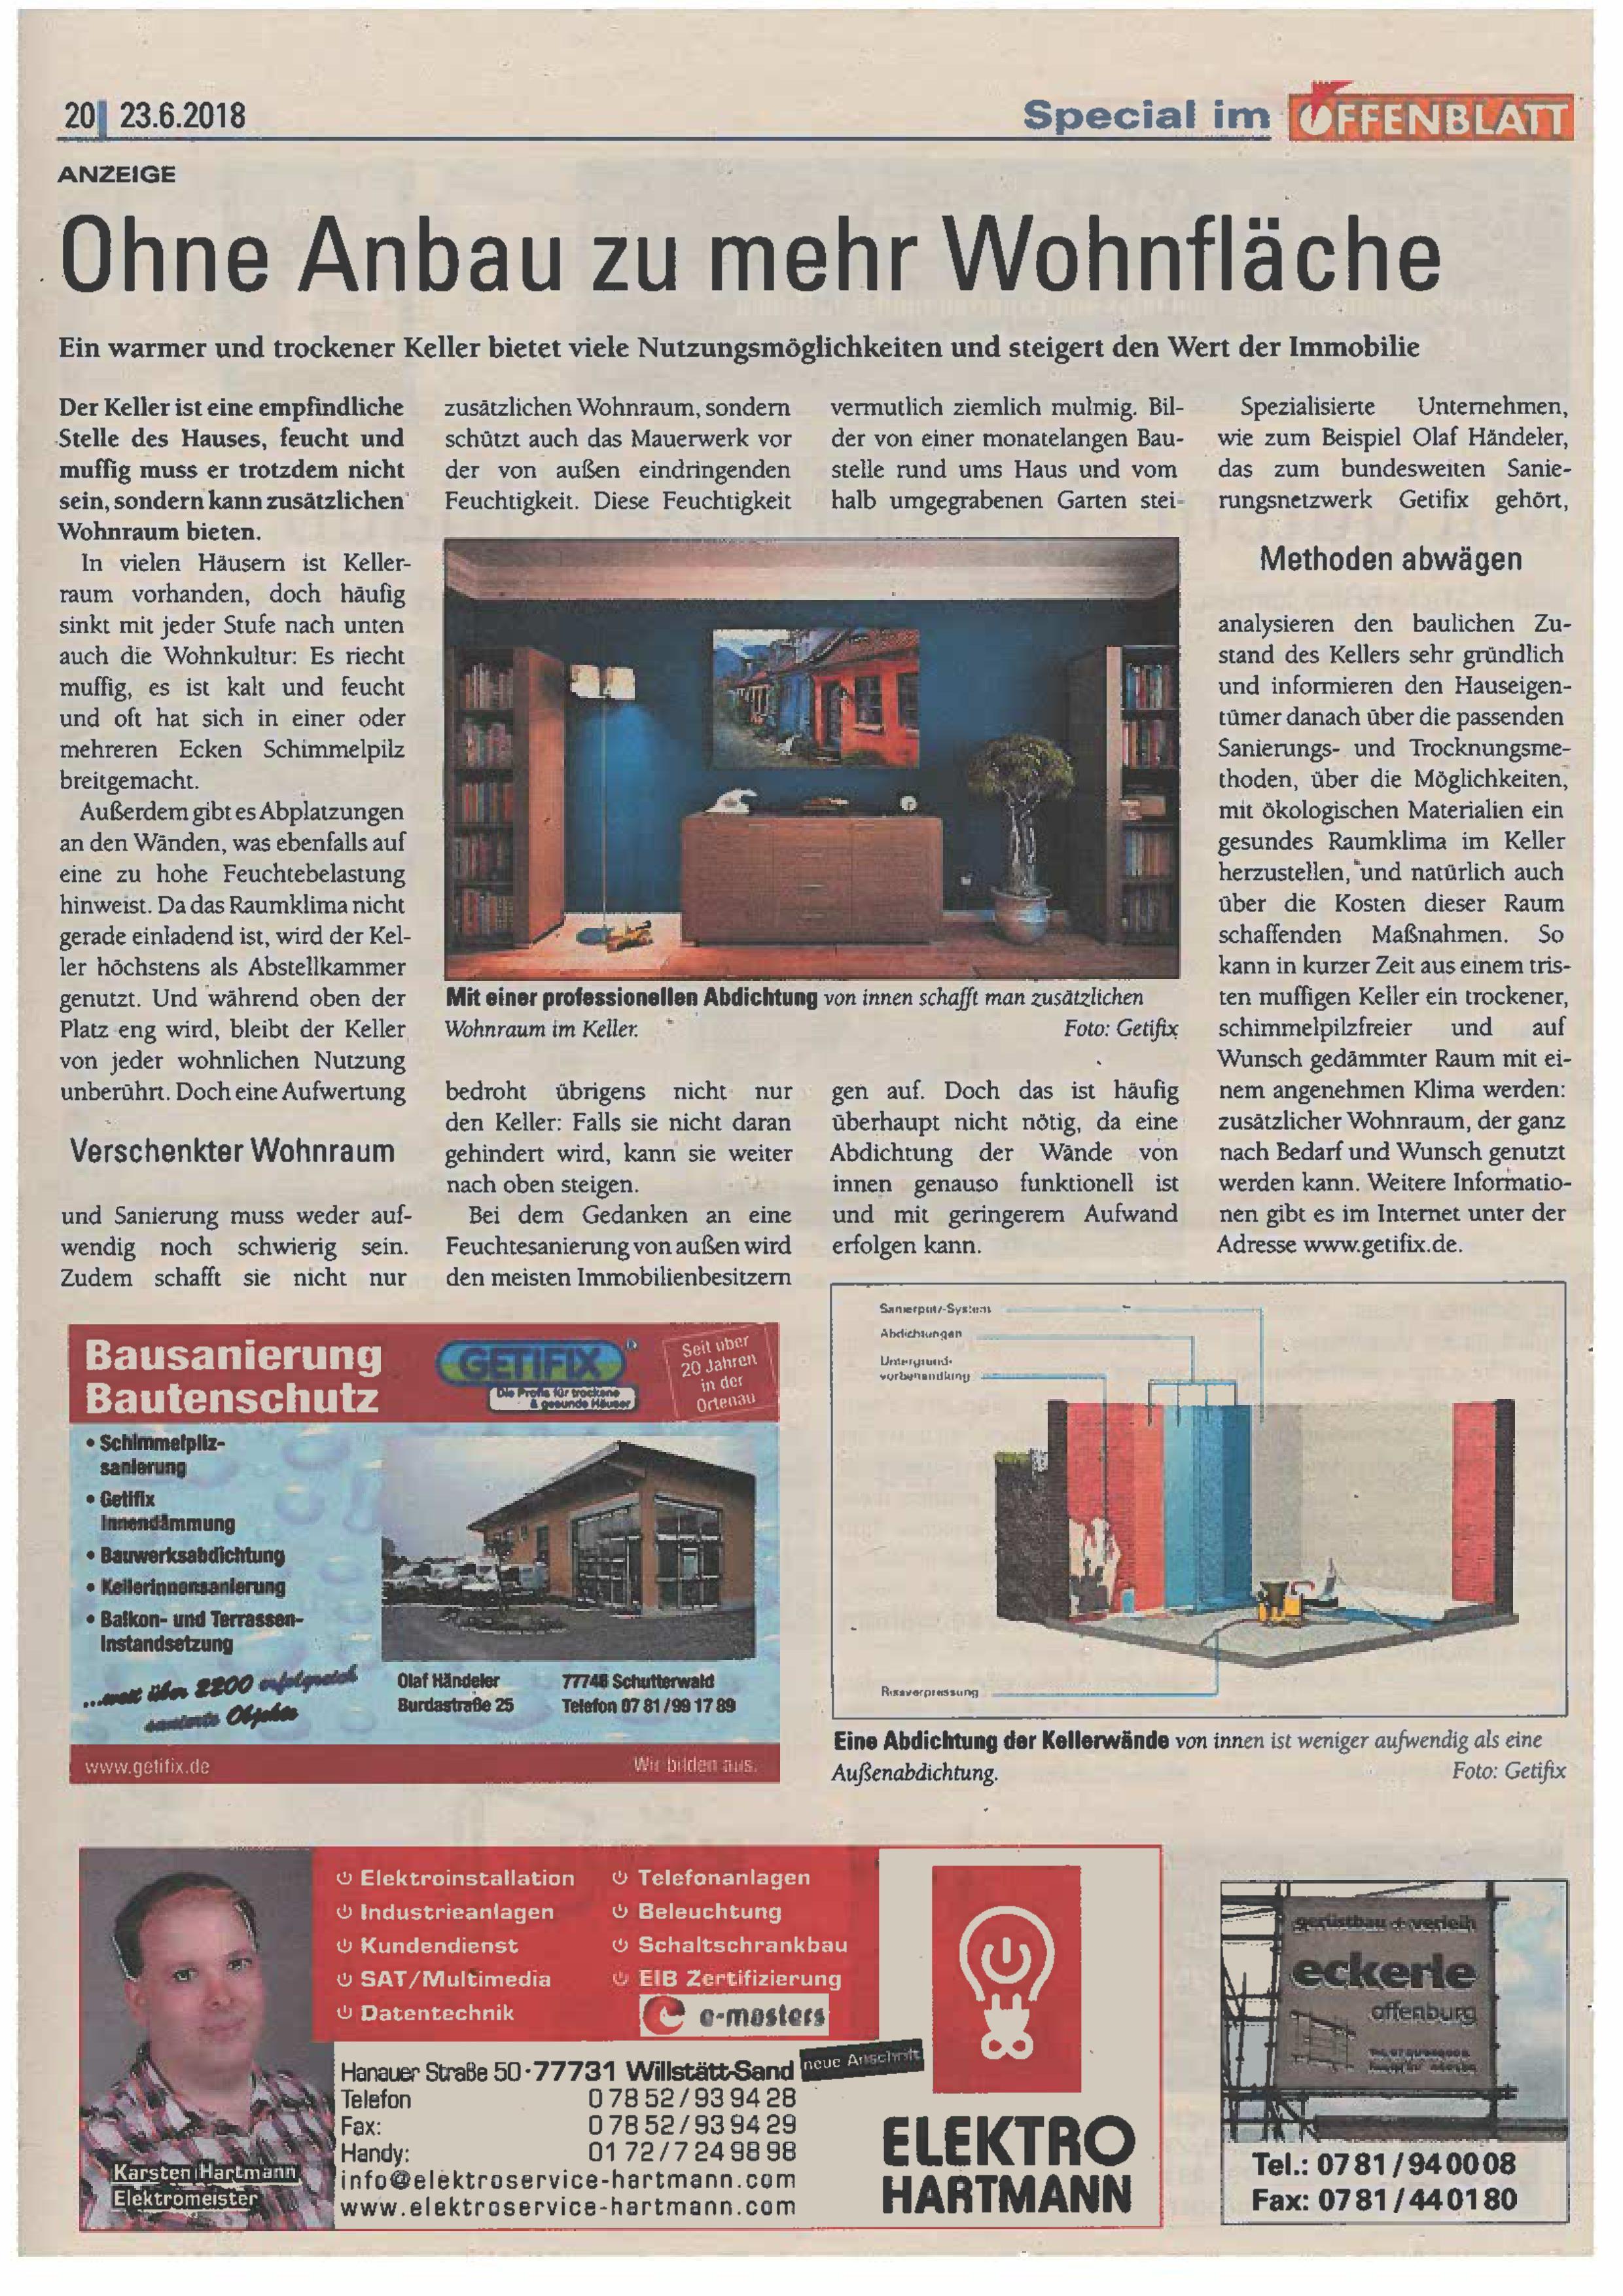 Offenblatt Juni 2018